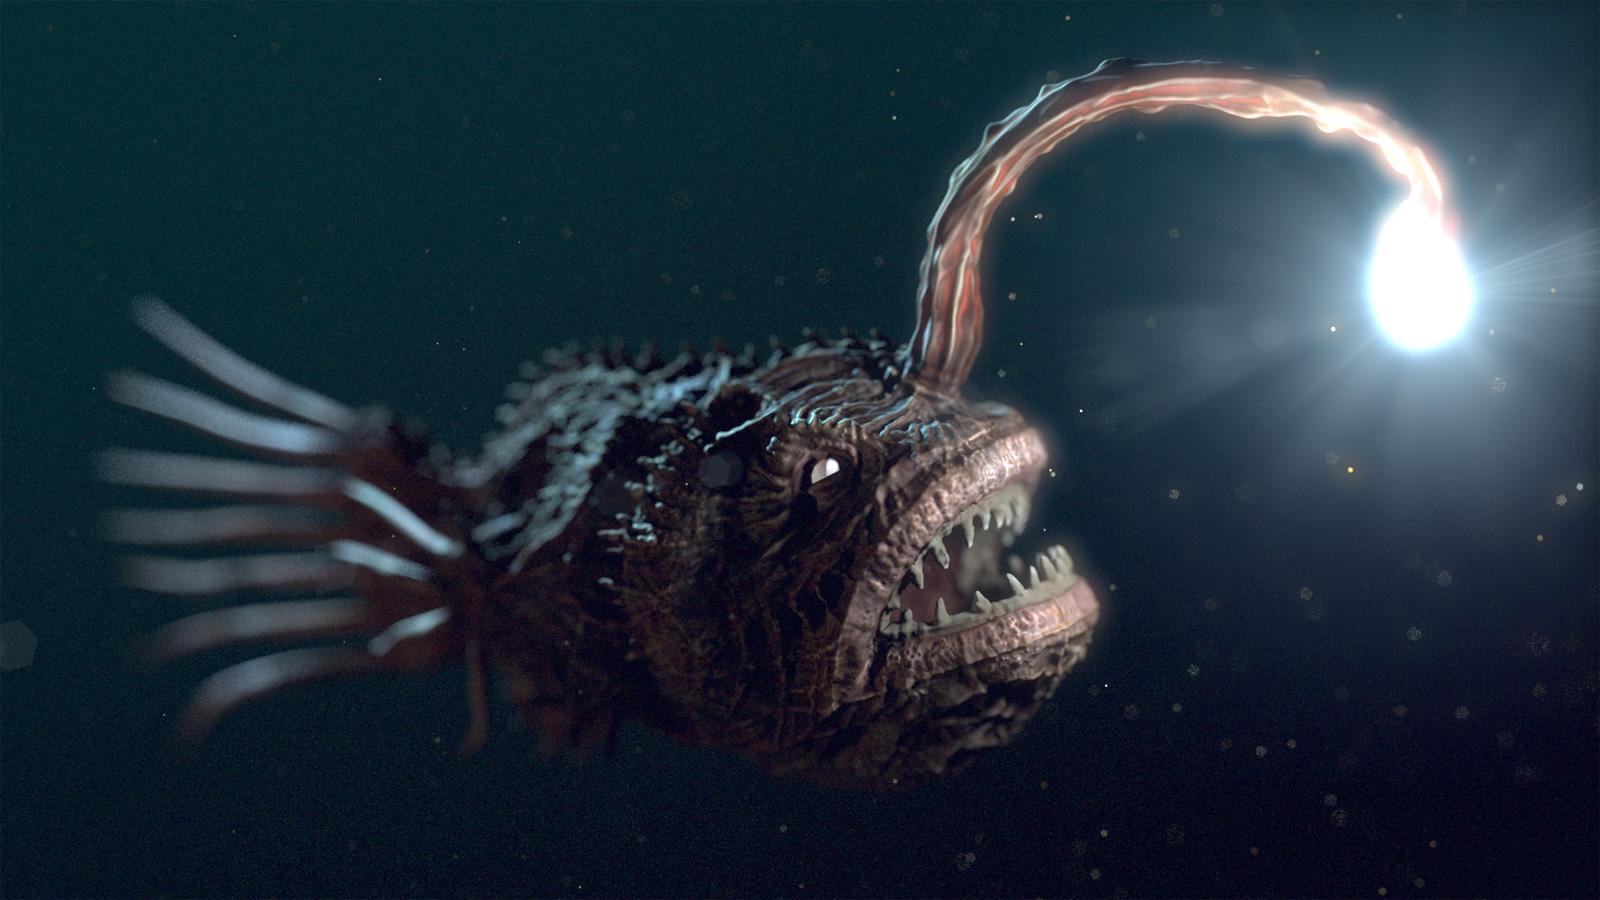 anglerfish and bioluminescent bacteria symbiotic relationship